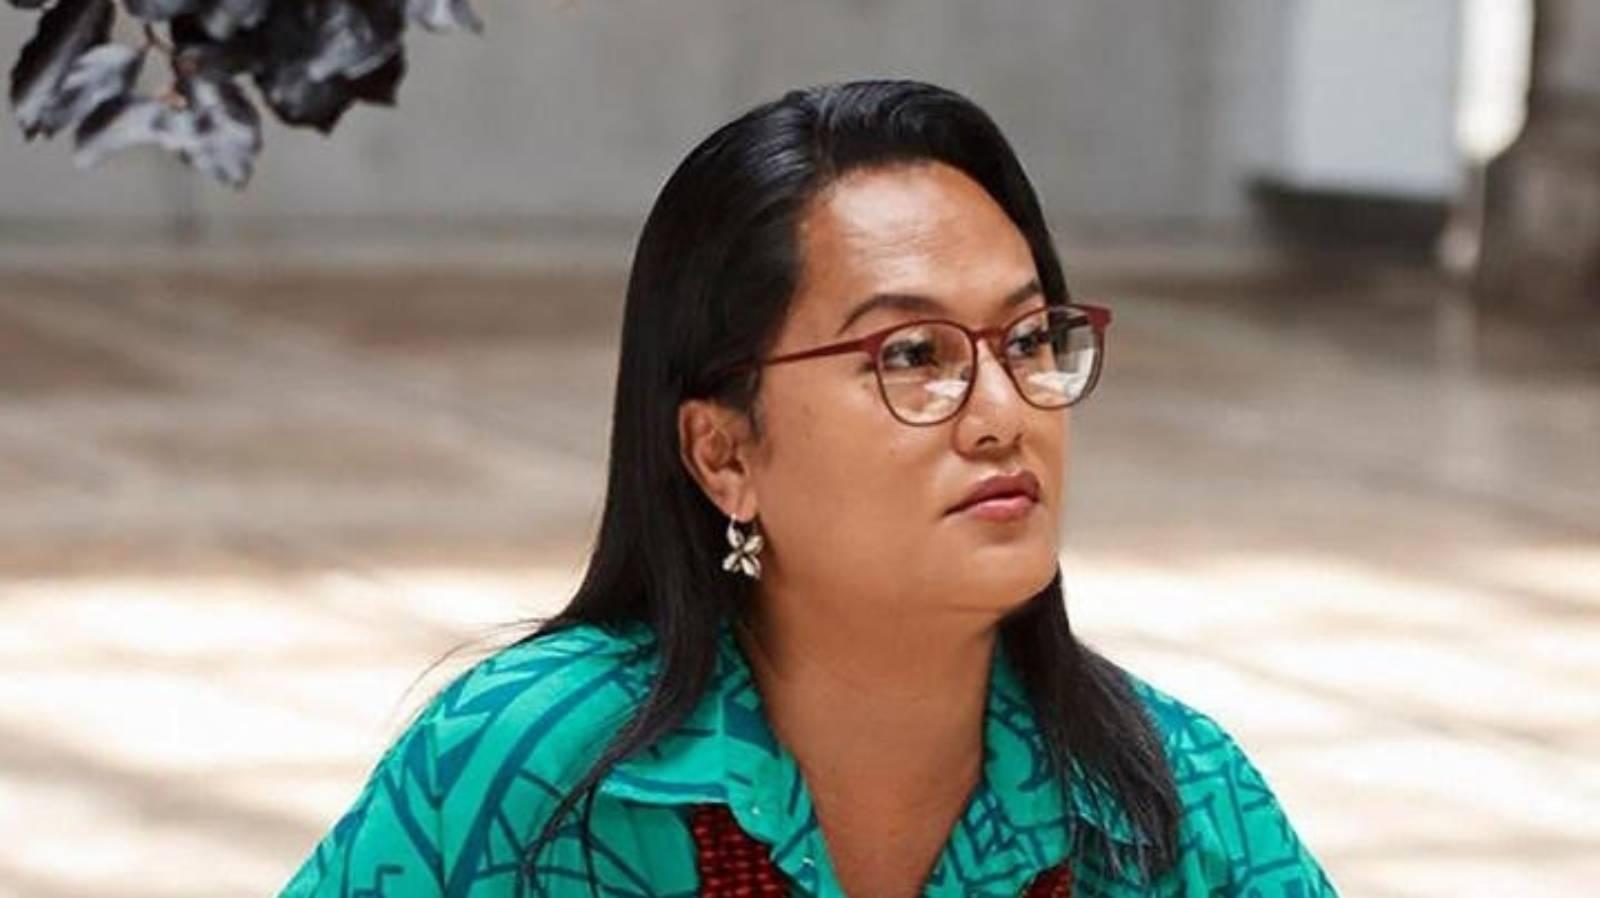 Dawn Raids apology should bring change, Samoans say